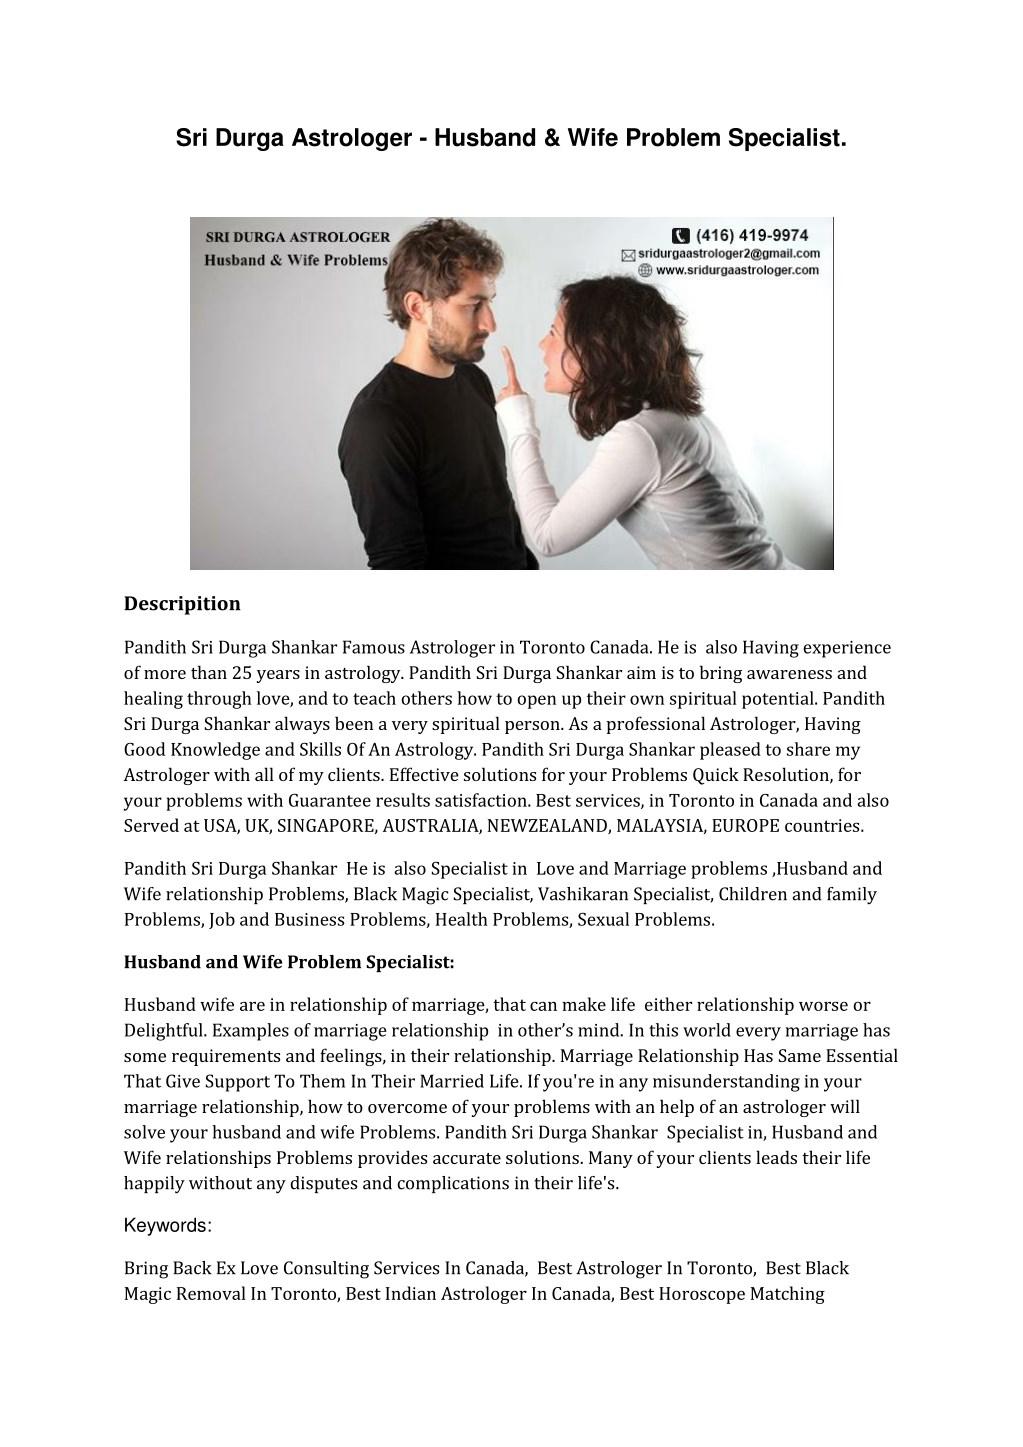 PPT - Sri Durga Astrologer - Husband & Wife Problem Specialist